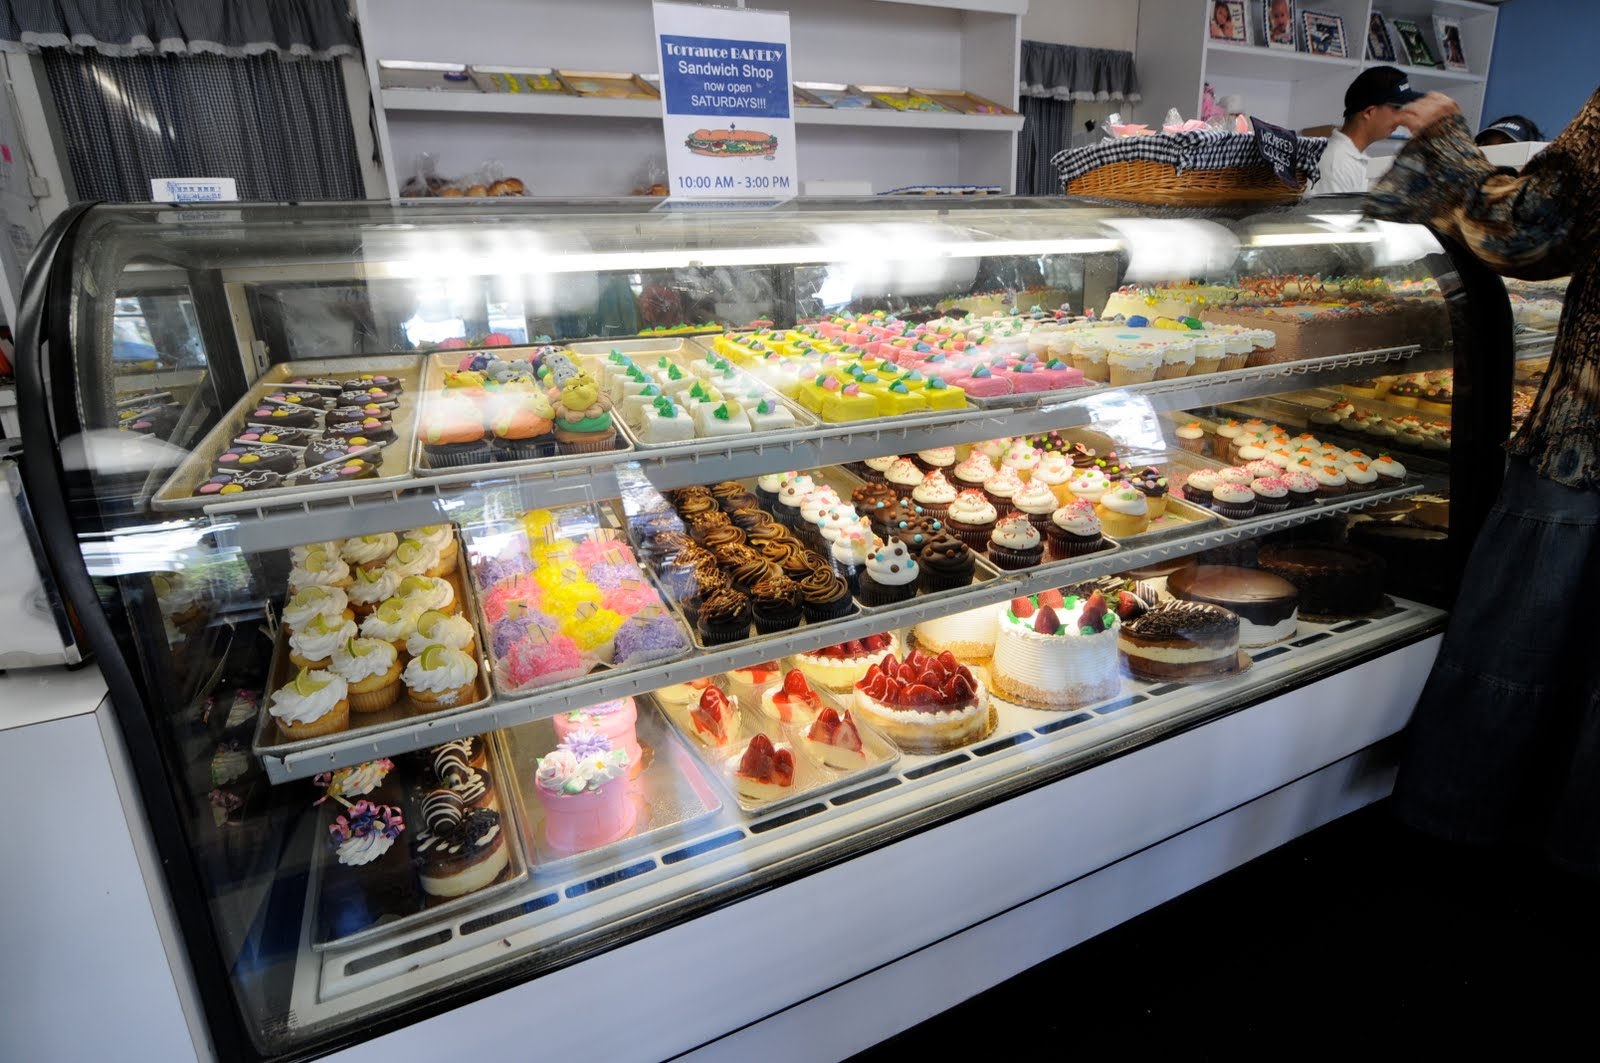 Torrance Bakery Cupcakes